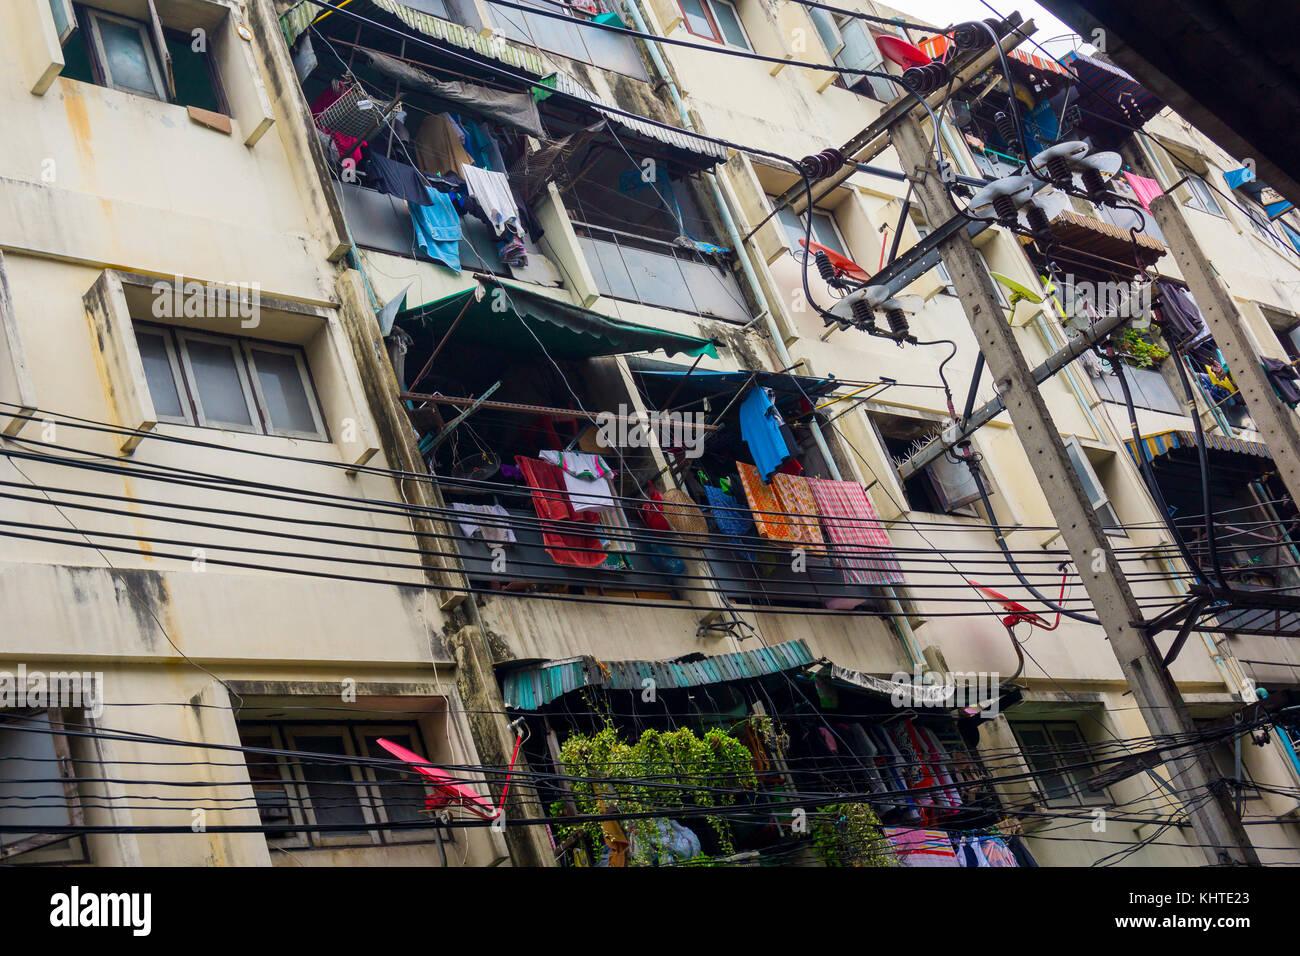 Façade accueil pauvres à bangkok Photo Stock